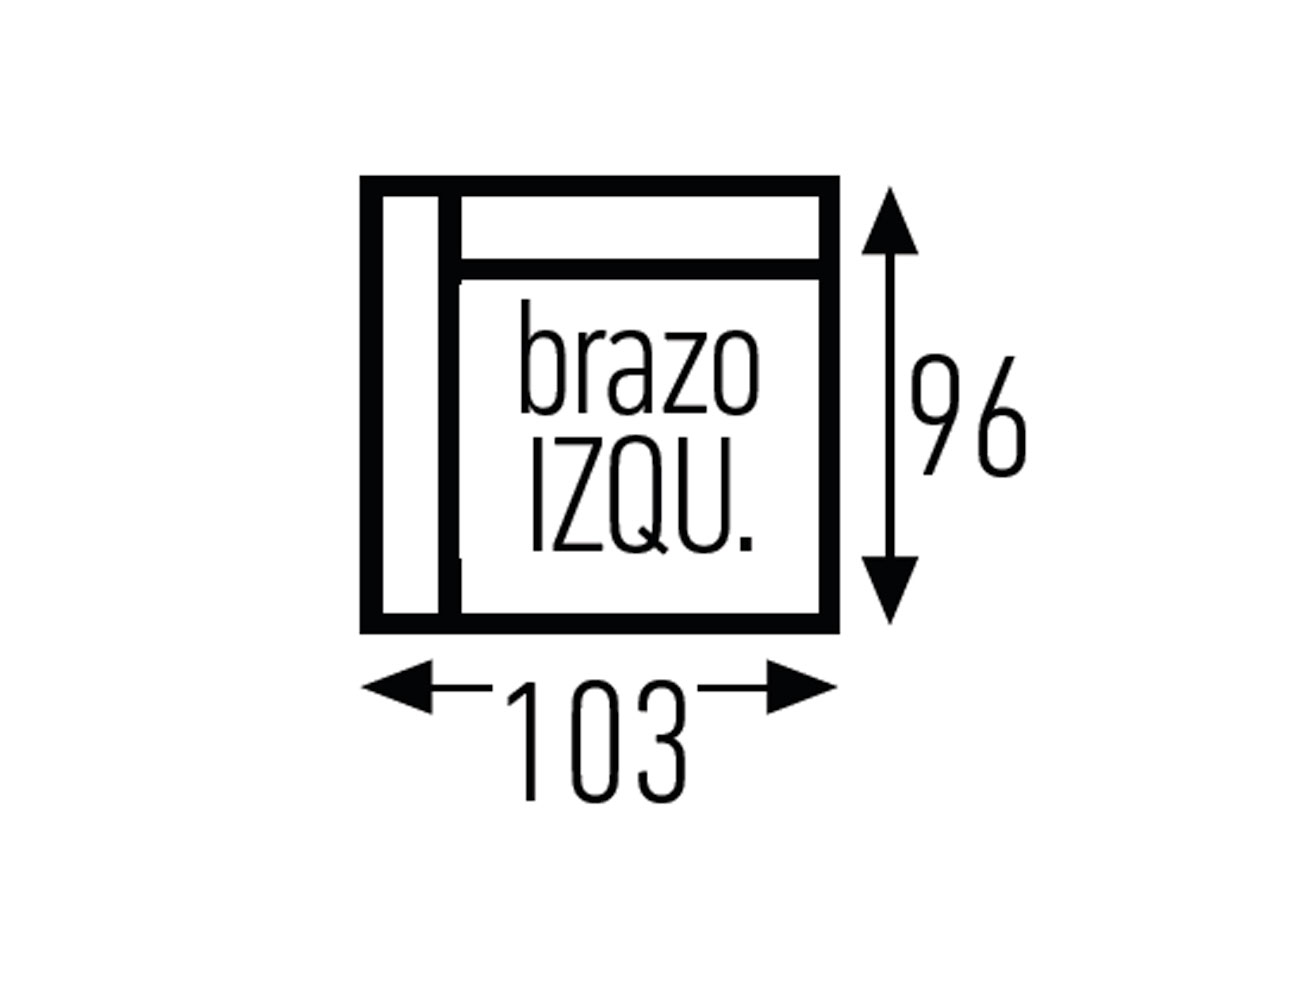 Croqus 1 plaz1